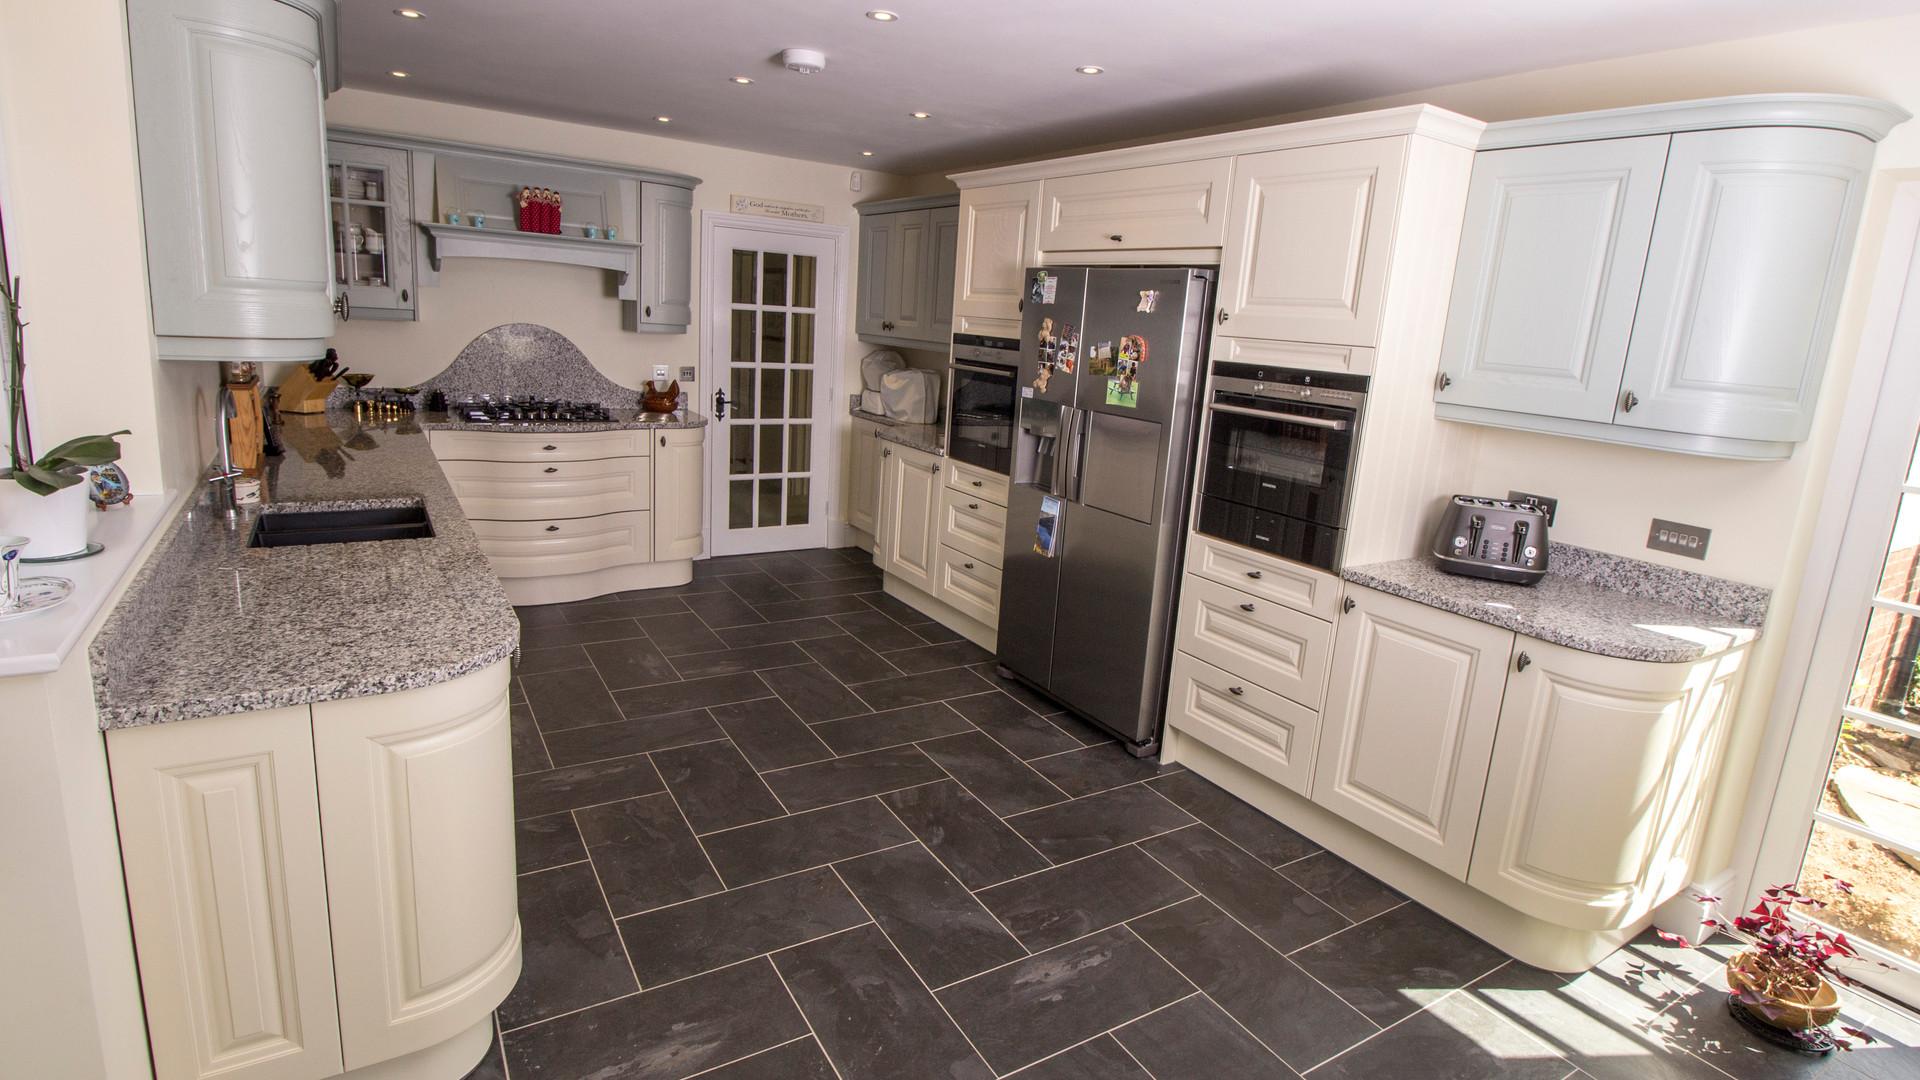 sidmouth-kitchen-010.jpg